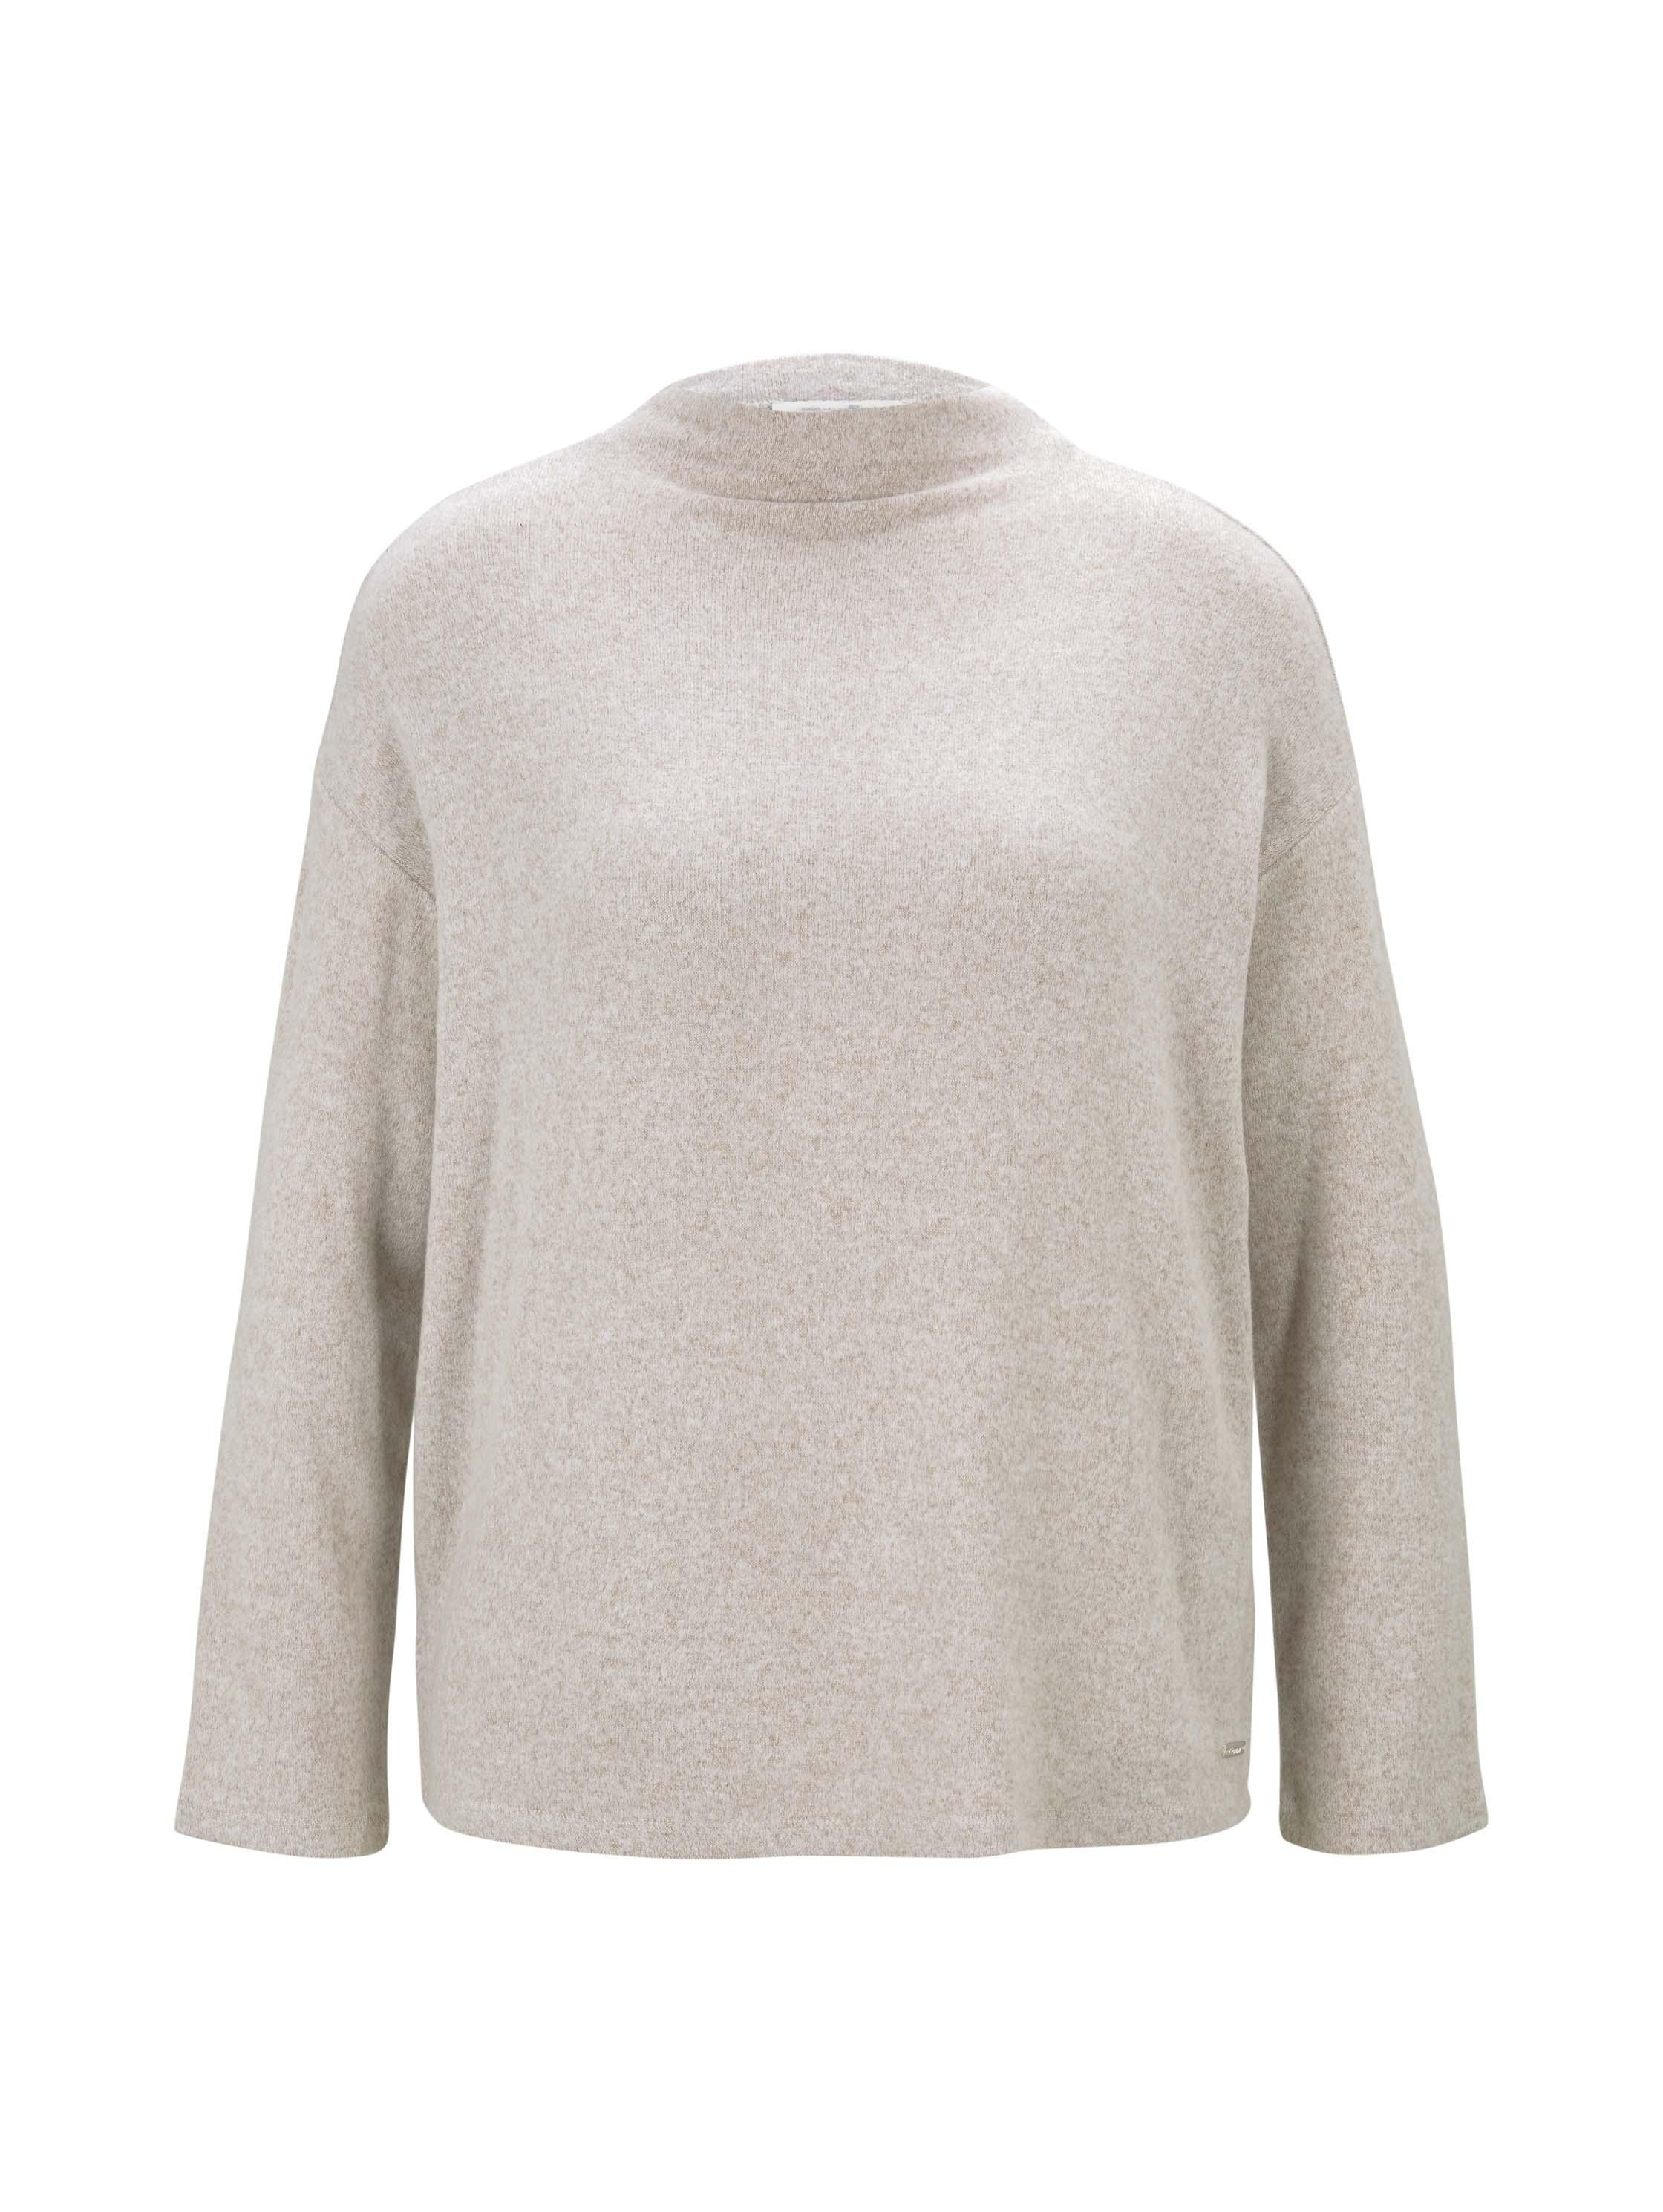 boxy sweater, cozy beige melange